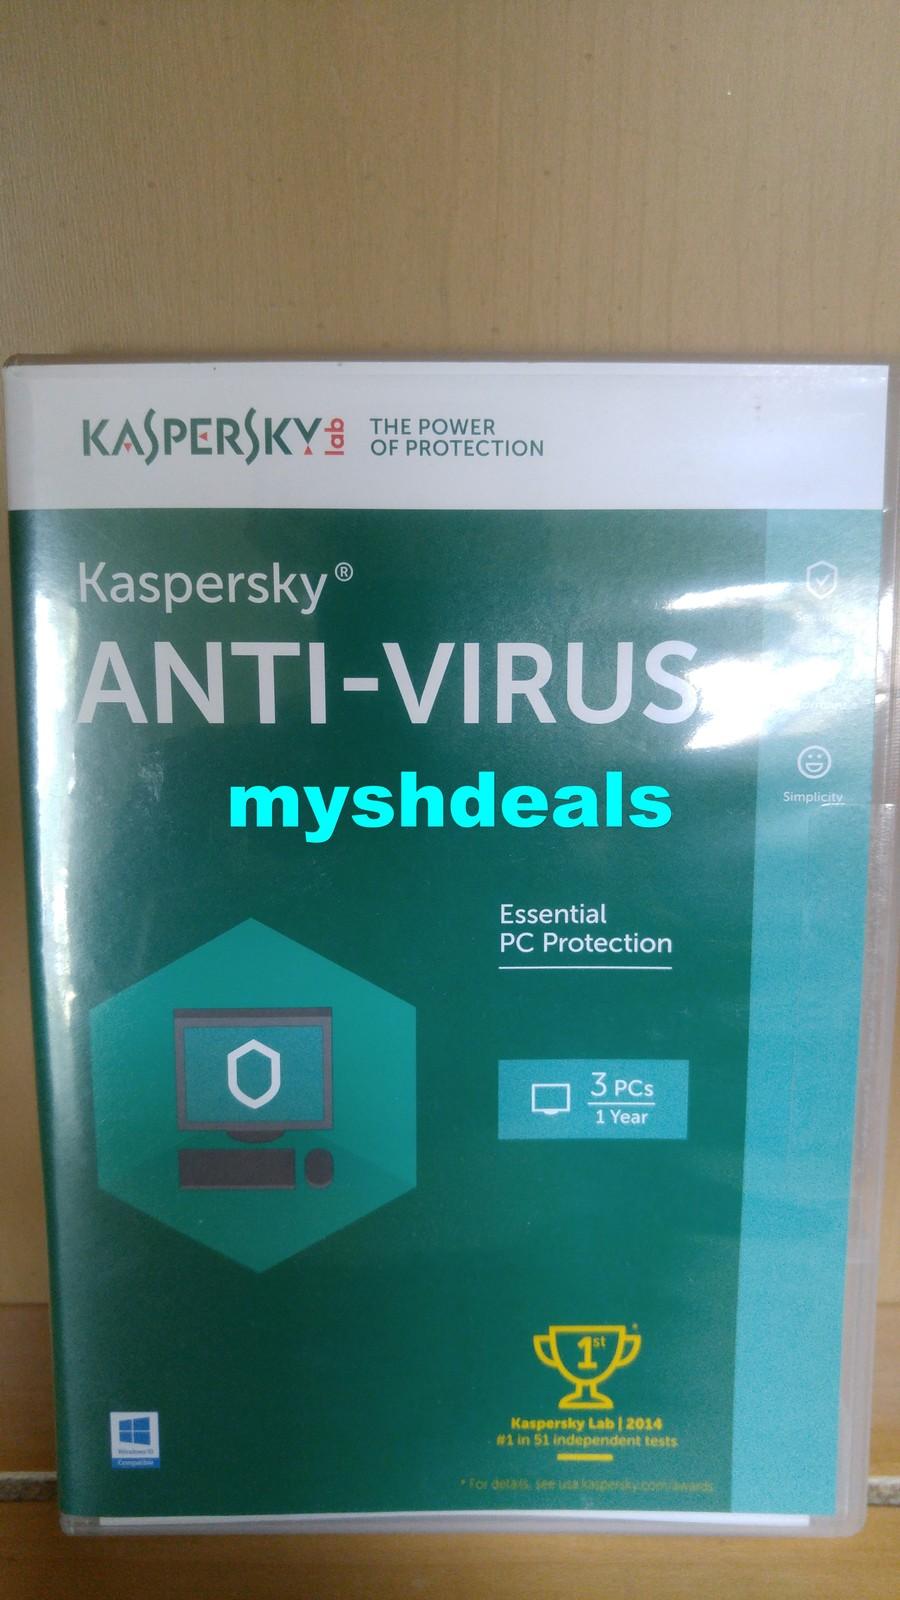 Kaspersky Anti Virus 2016 3 PCs 1 Year